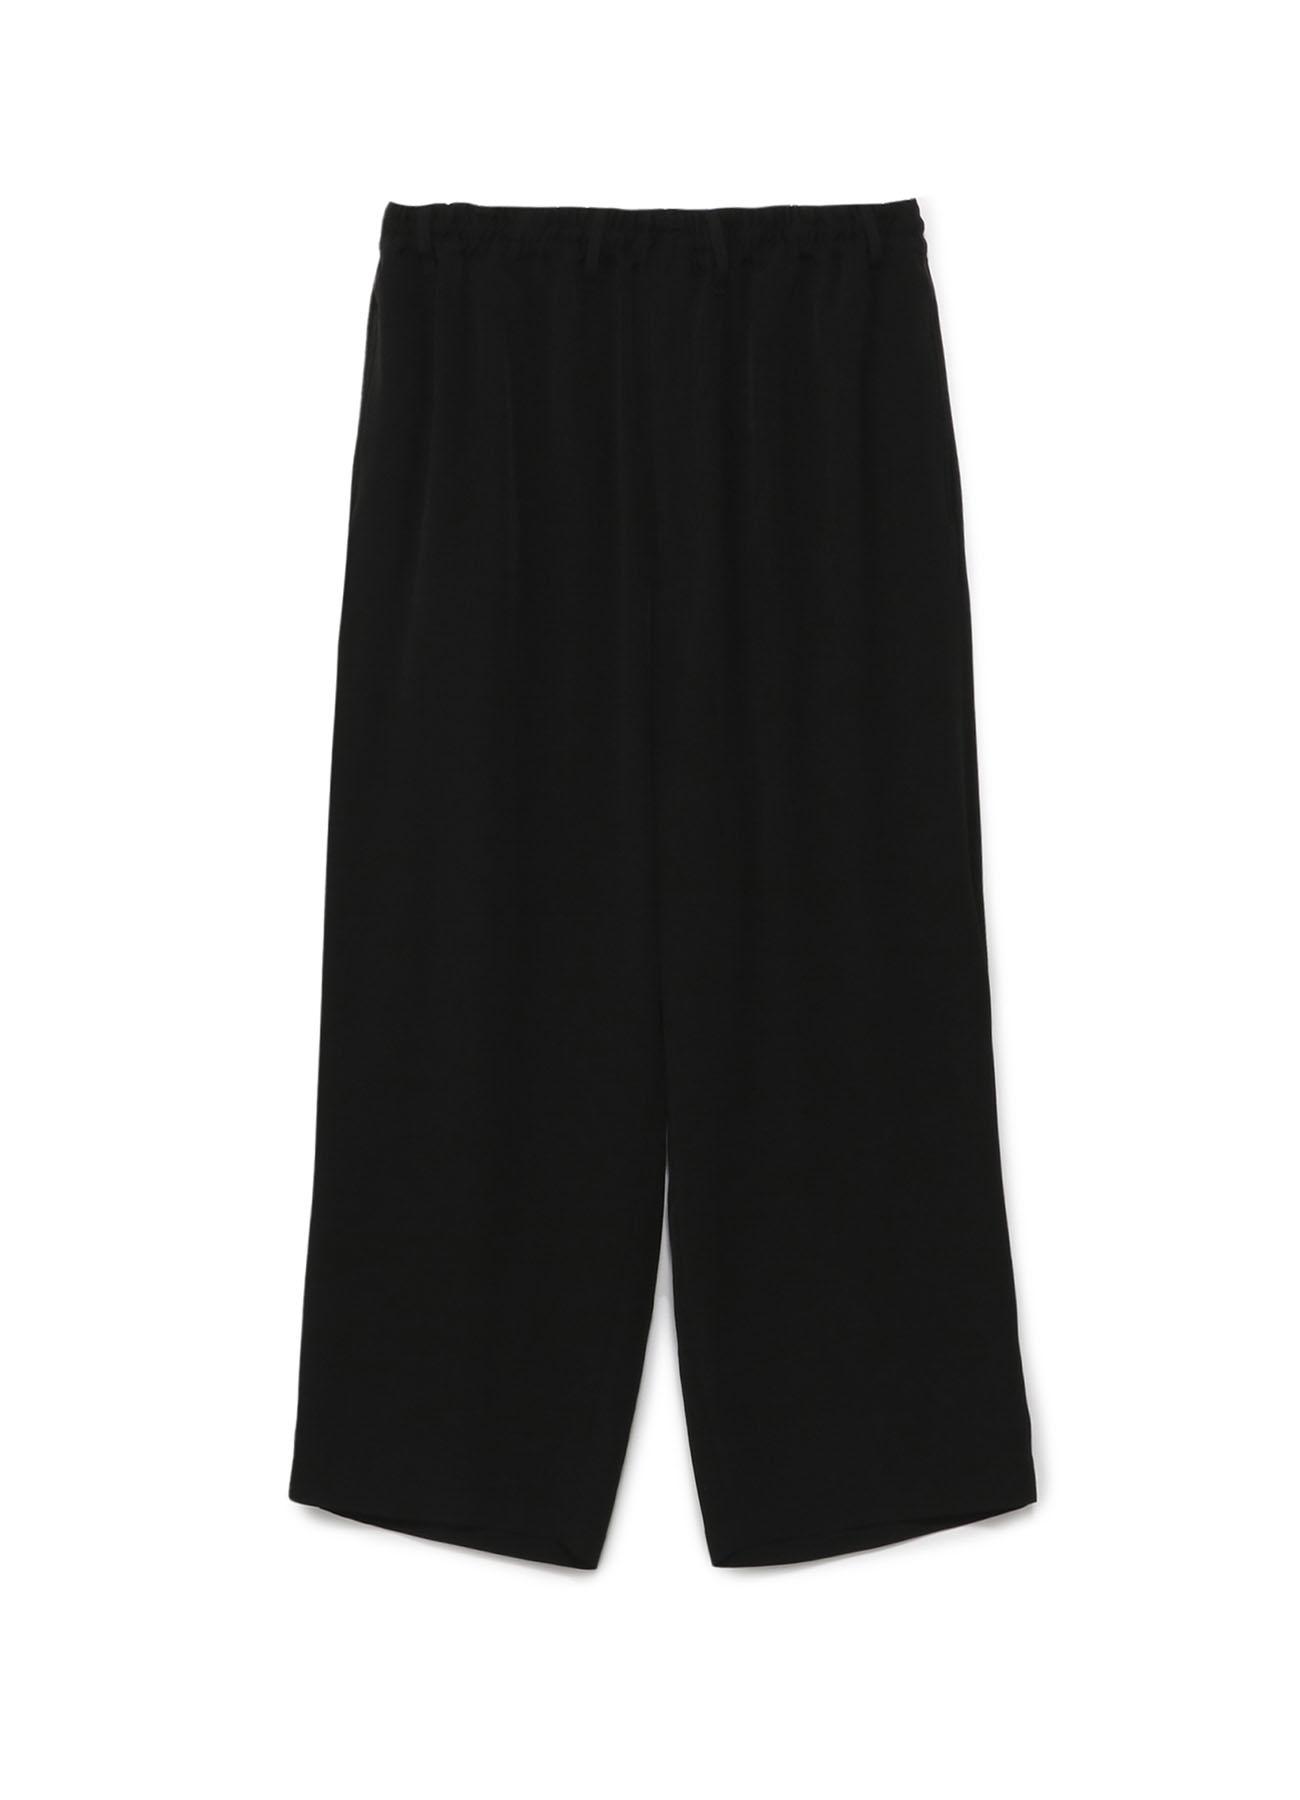 T/A vintage decyne Pajamas Pants